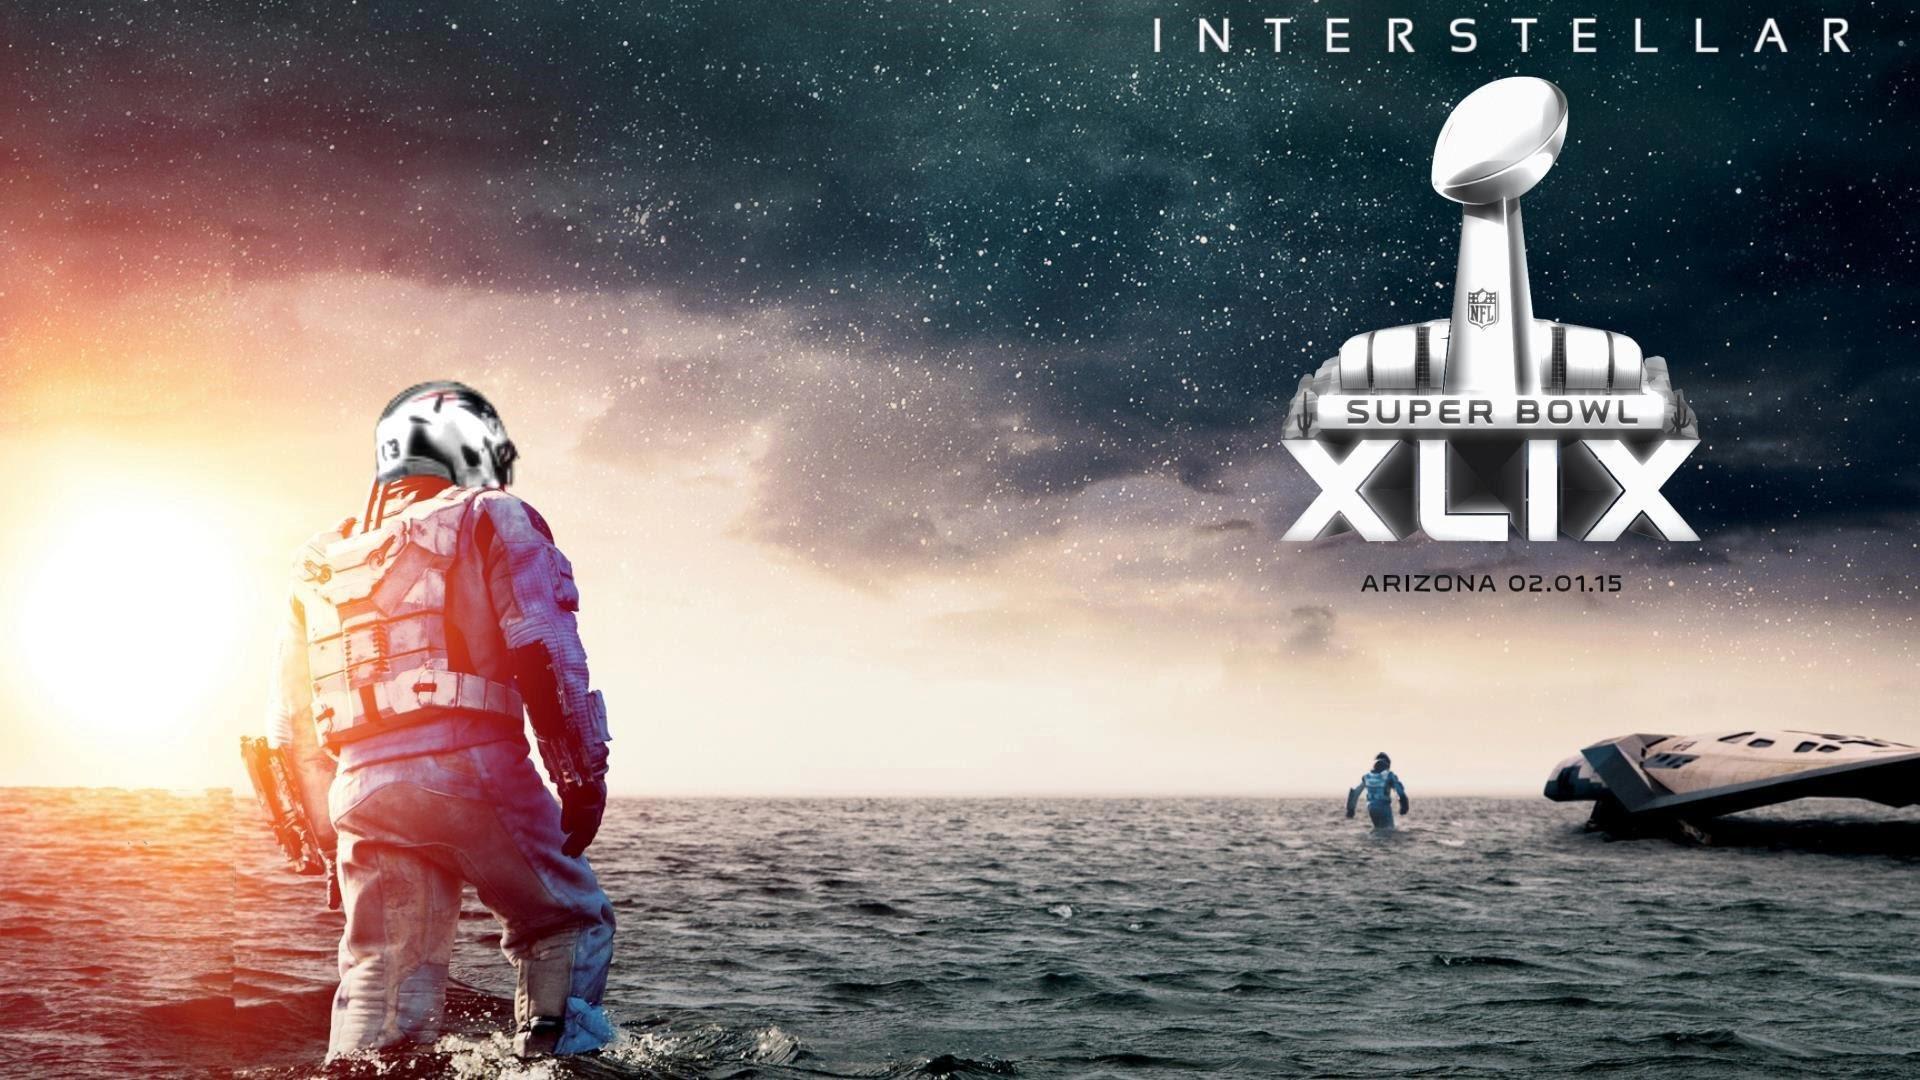 New England Patriots 2015 NFL Playoffs: (Interstellar Mix) Destination:  Super Bowl XLIX [HD] – YouTube